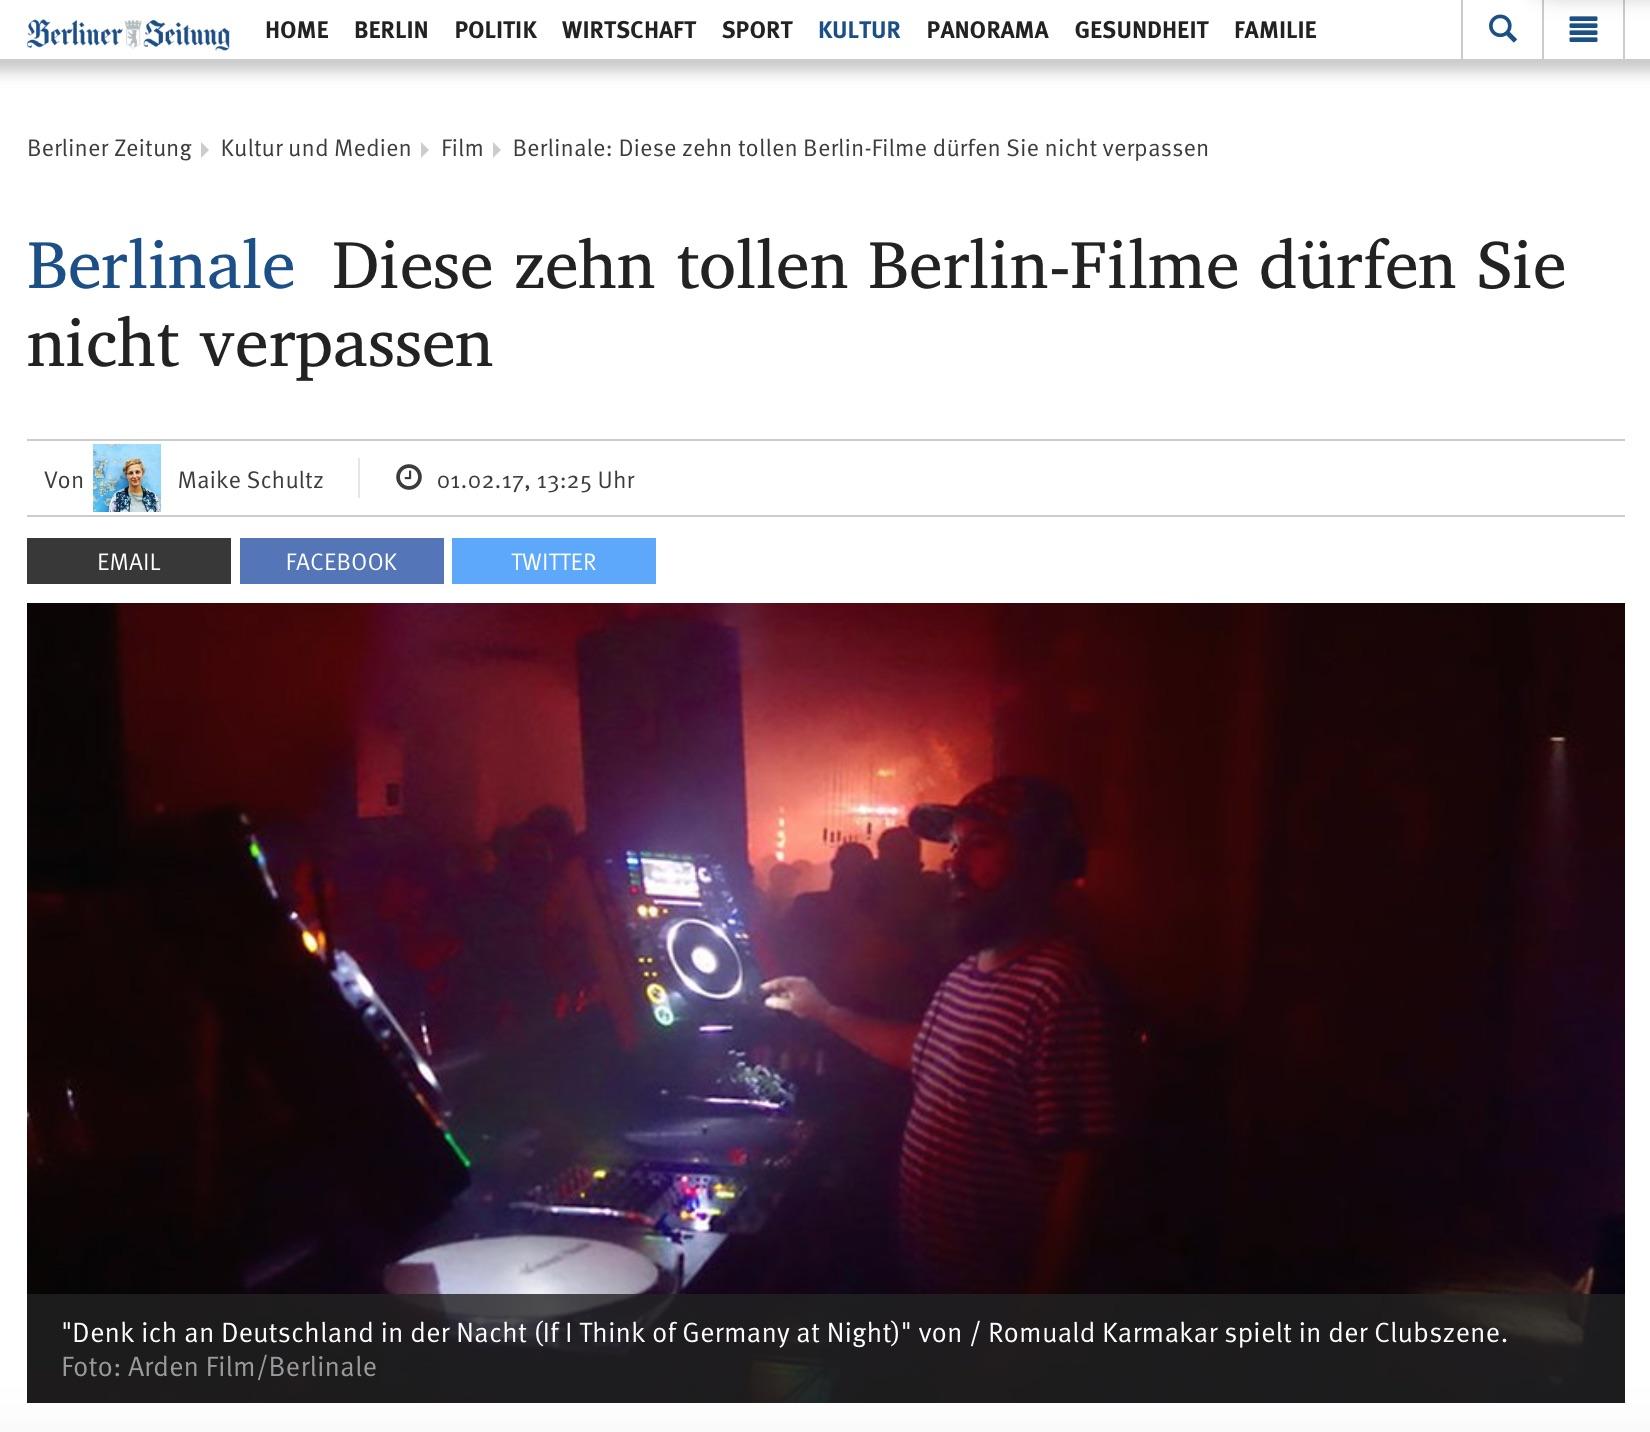 Berlinale:Diese zehn tollen Berlin-Filme dürfen Sie nicht verpassen